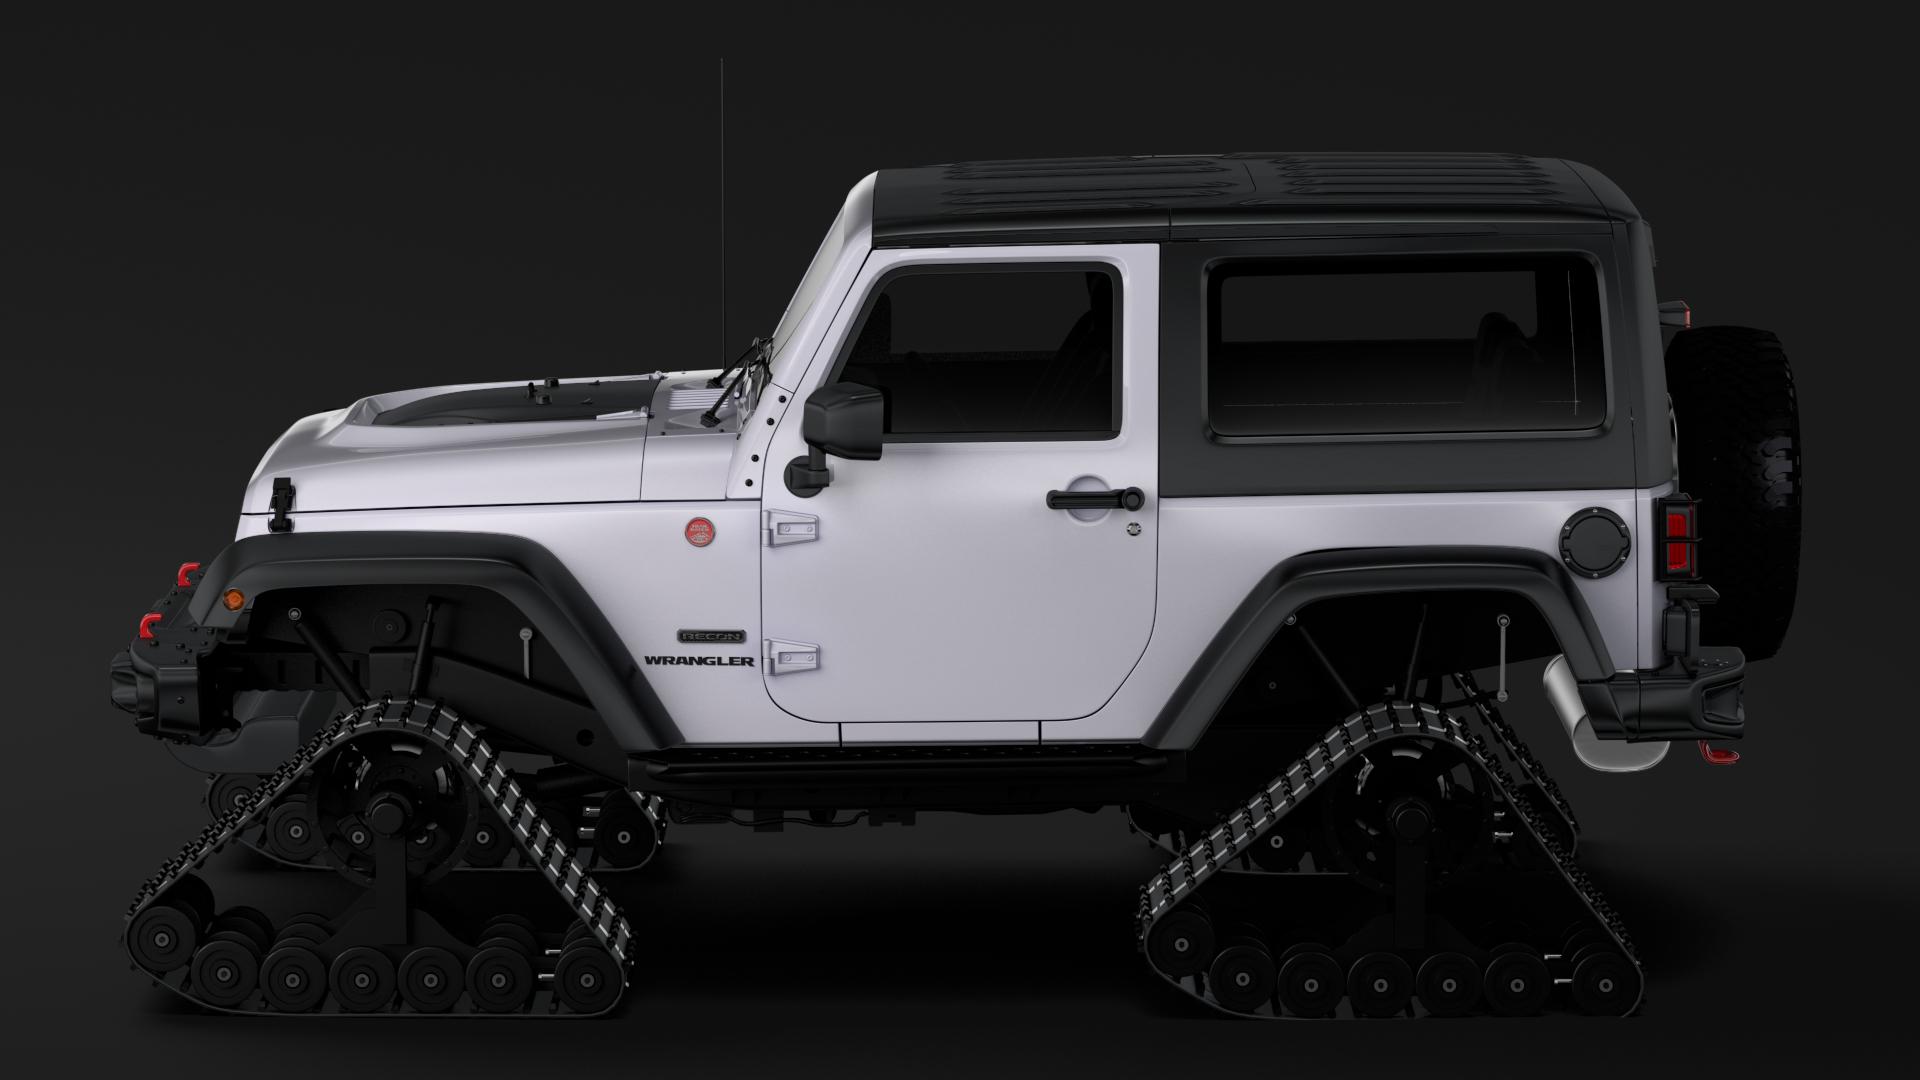 jeep wrangler crawler rubicon recon jk 2017 3d model max fbx c4d lwo ma mb hrc xsi obj 276916